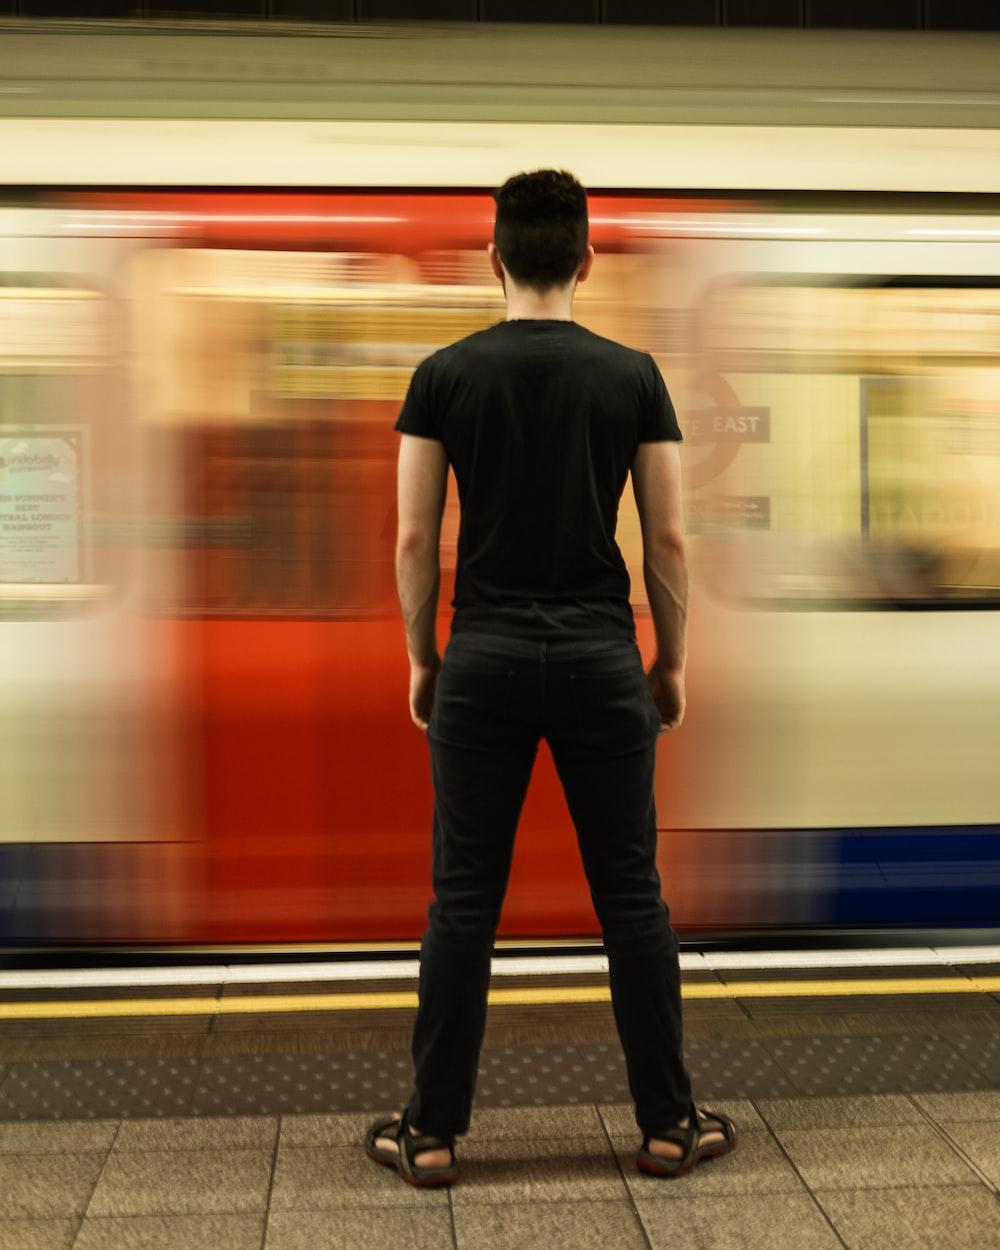 man in black t-shirt standing near train